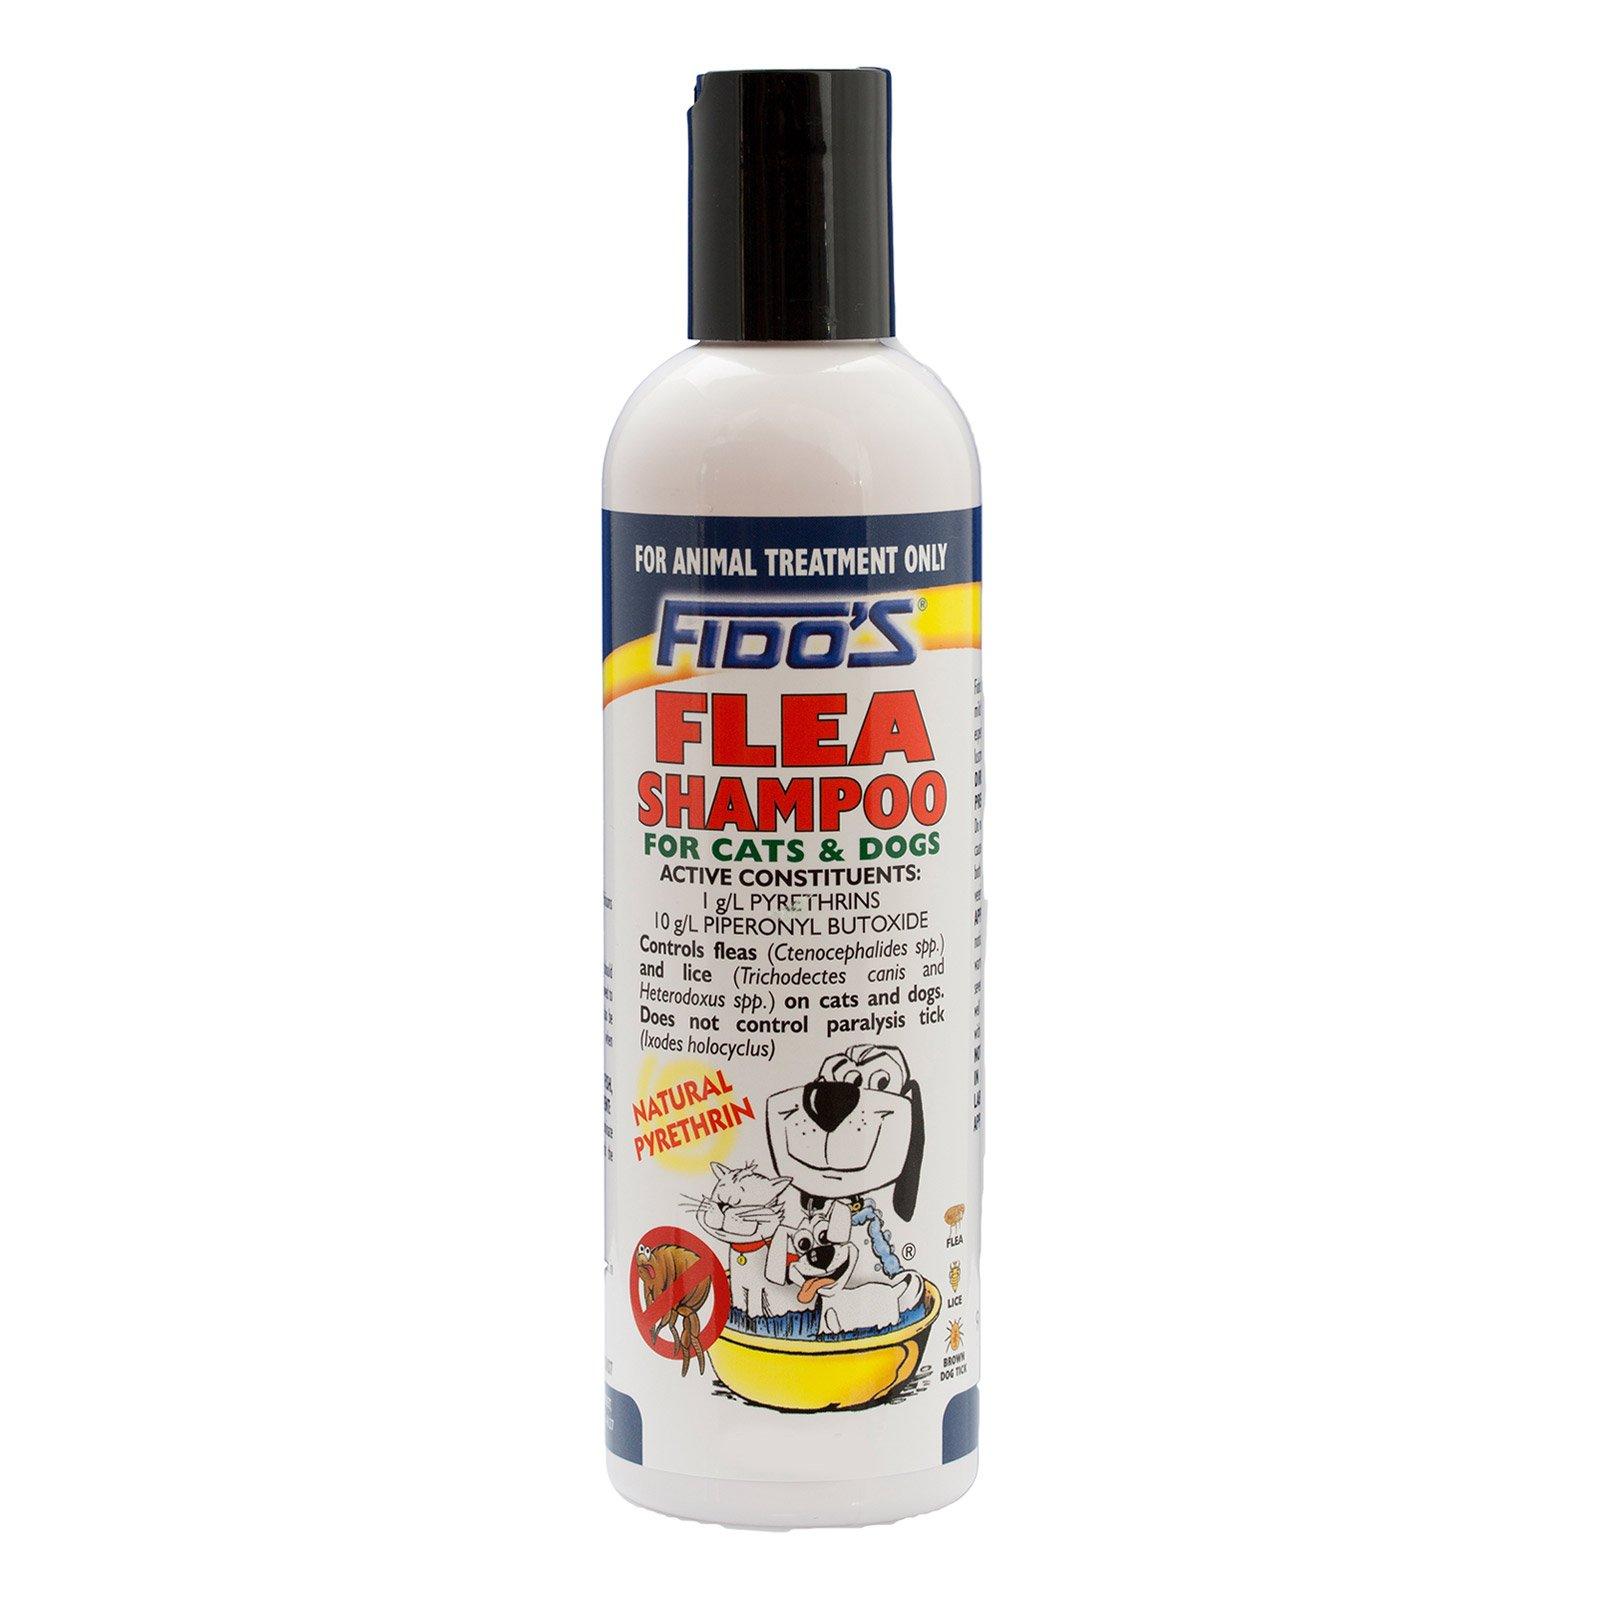 Fidos Flea Shampoo